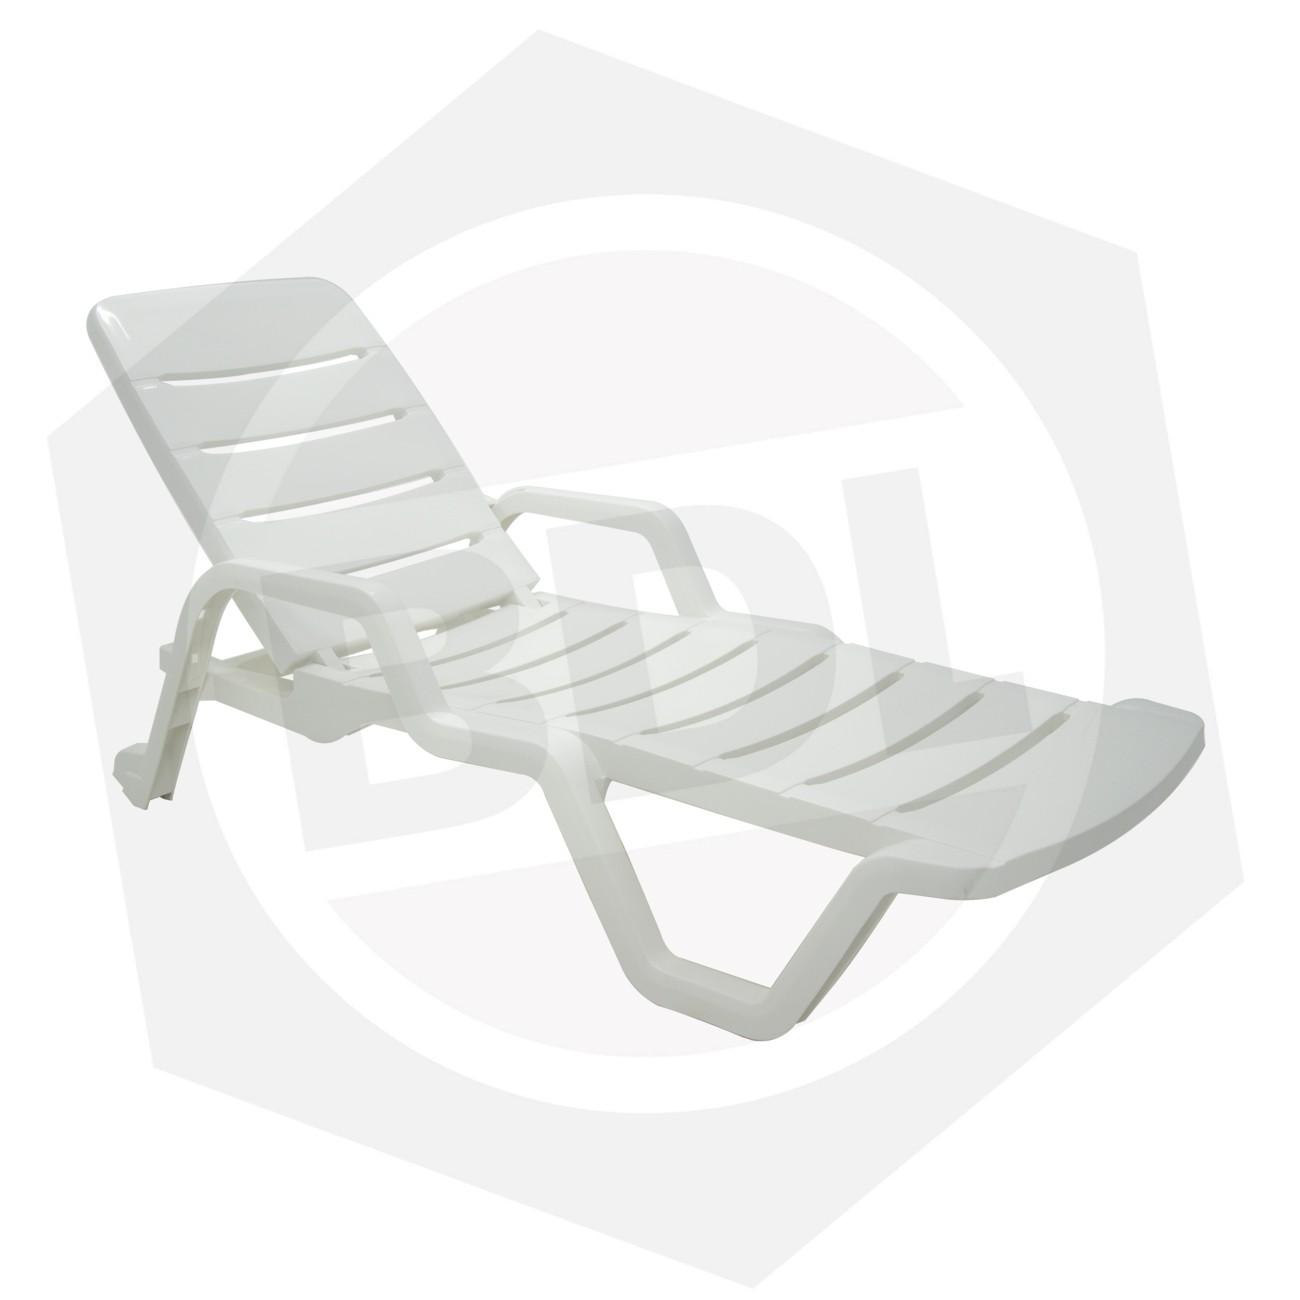 Reposera Plástica LEBLON Tramontina 92256/010 - Blanca